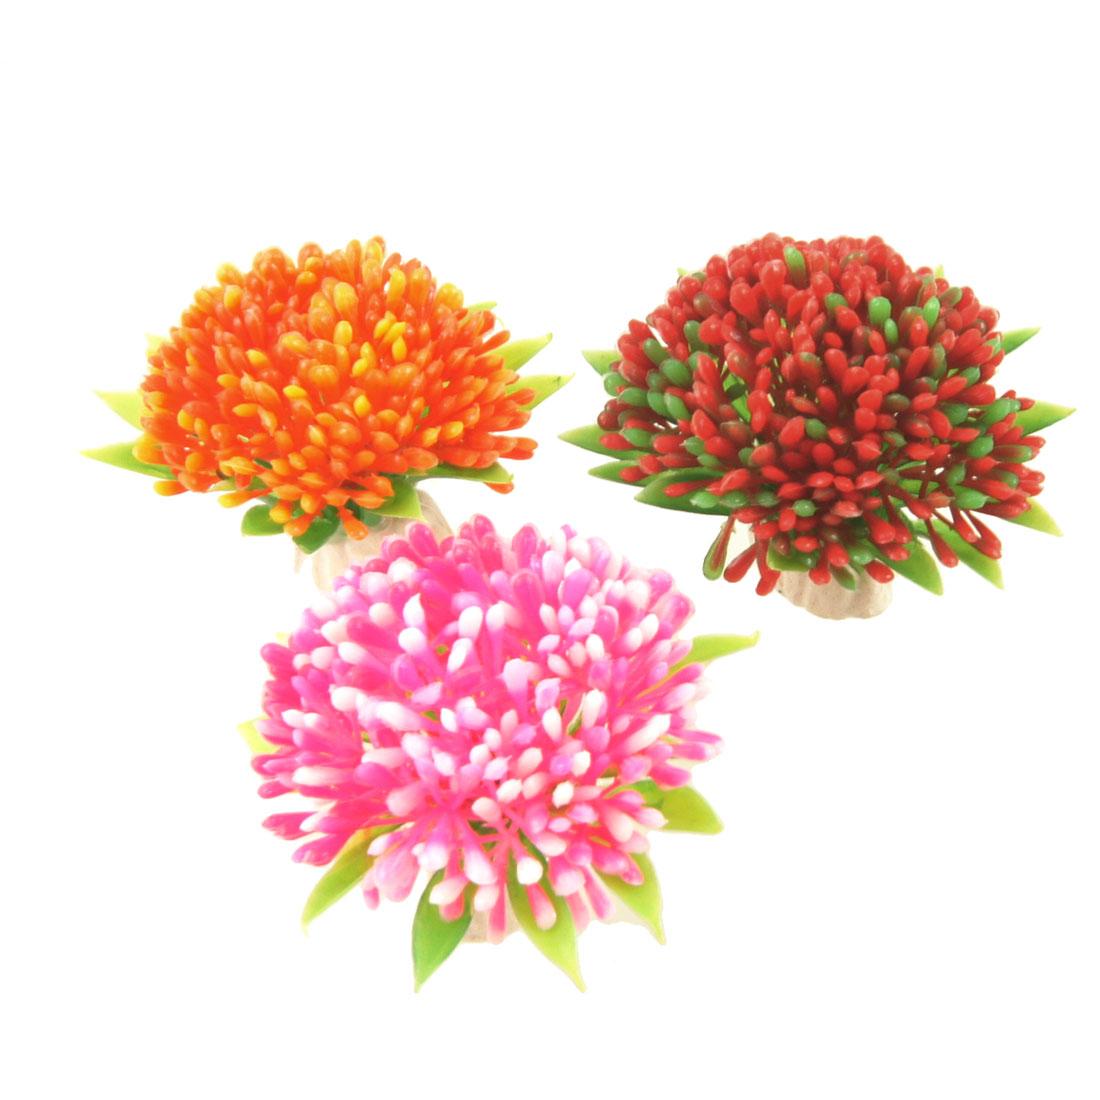 Fish Tank Artificial Red Pink Orange Flower Plants Ornaments 3 Pcs